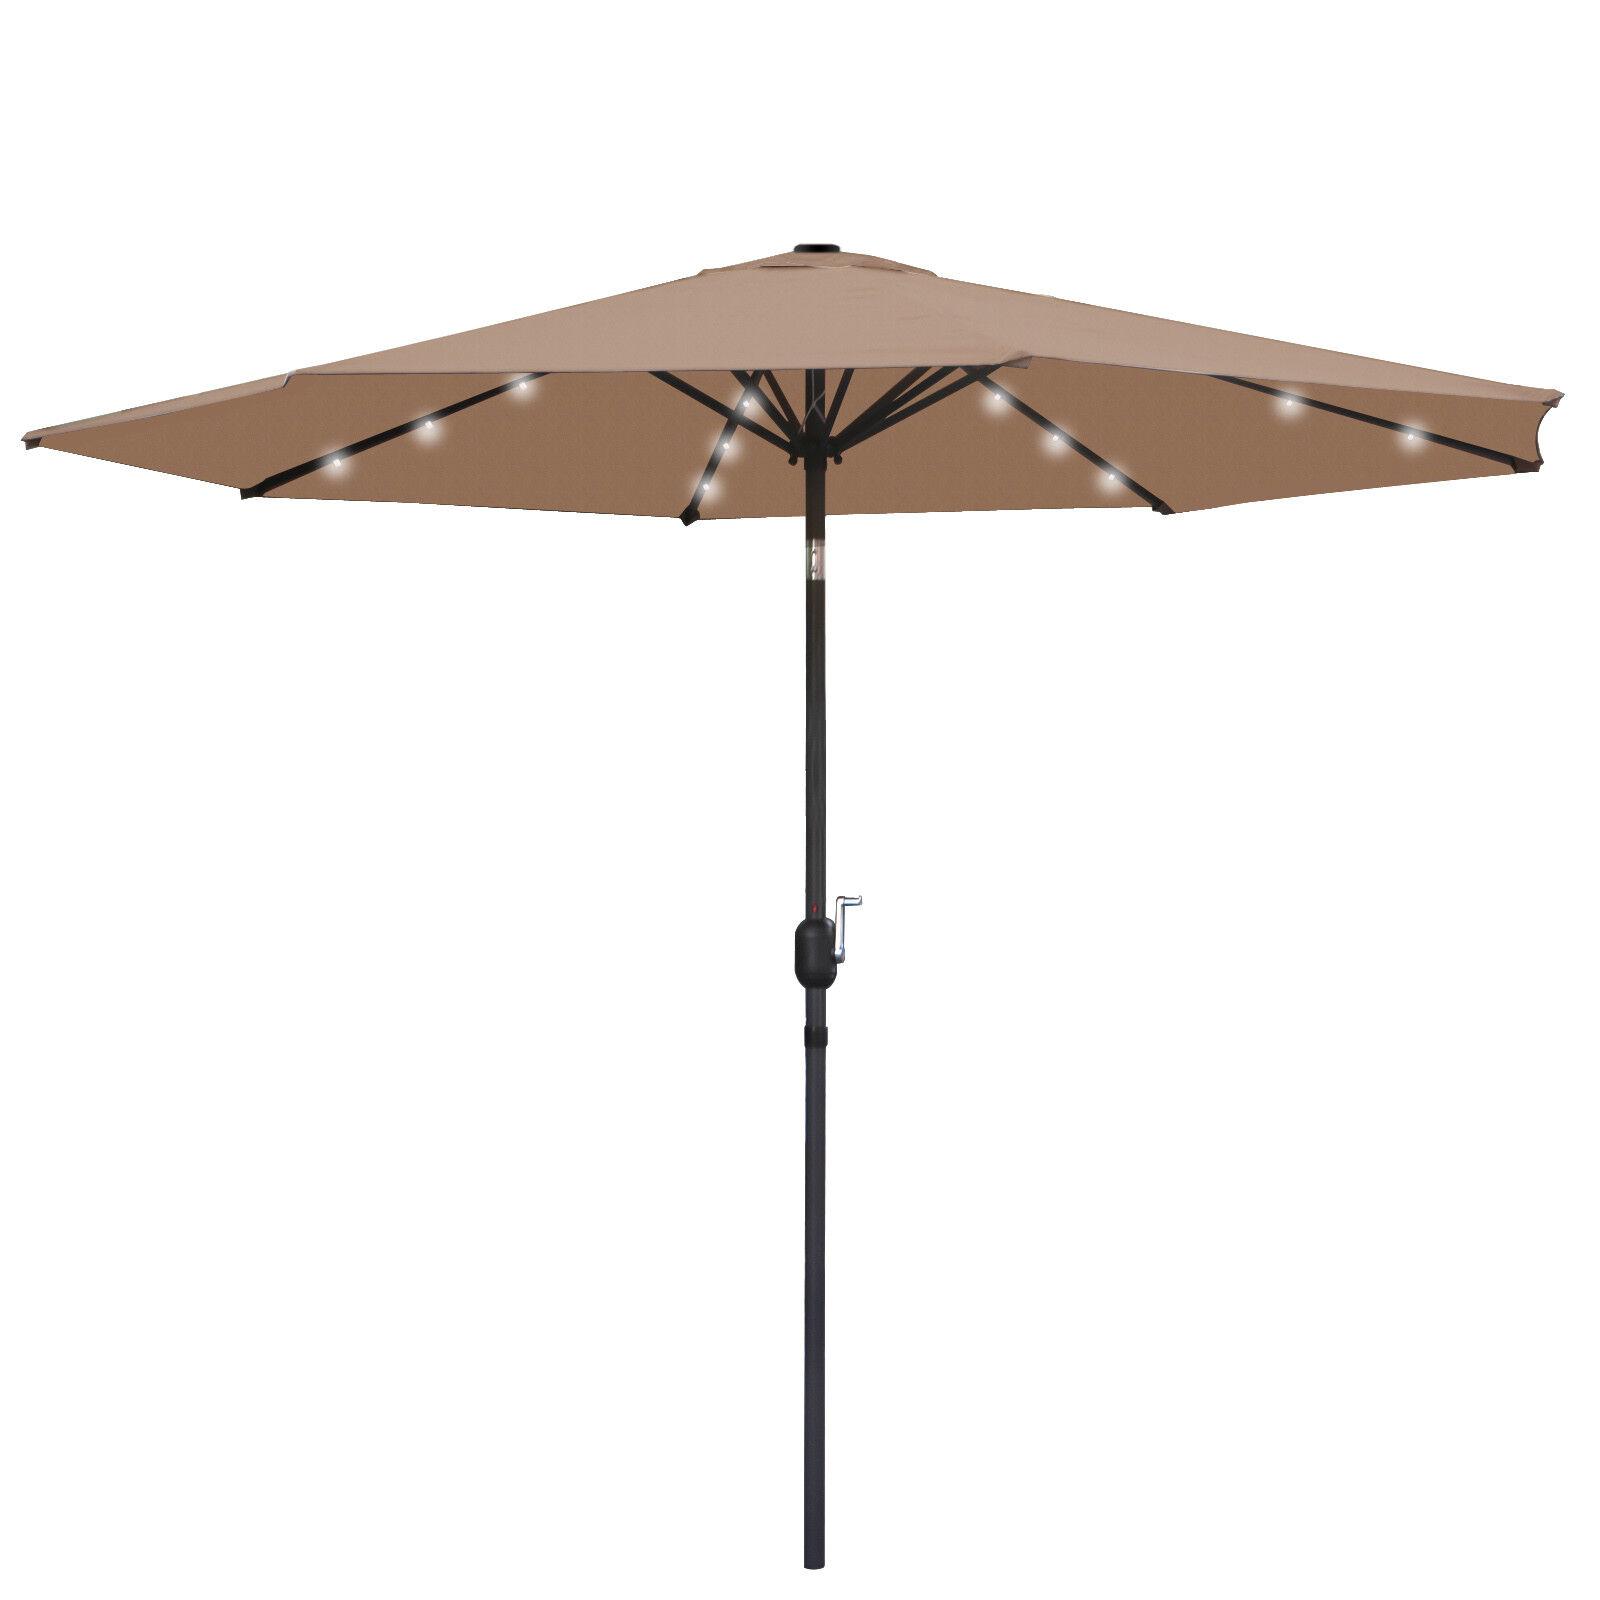 10ft solar umbrella led lighted patio market